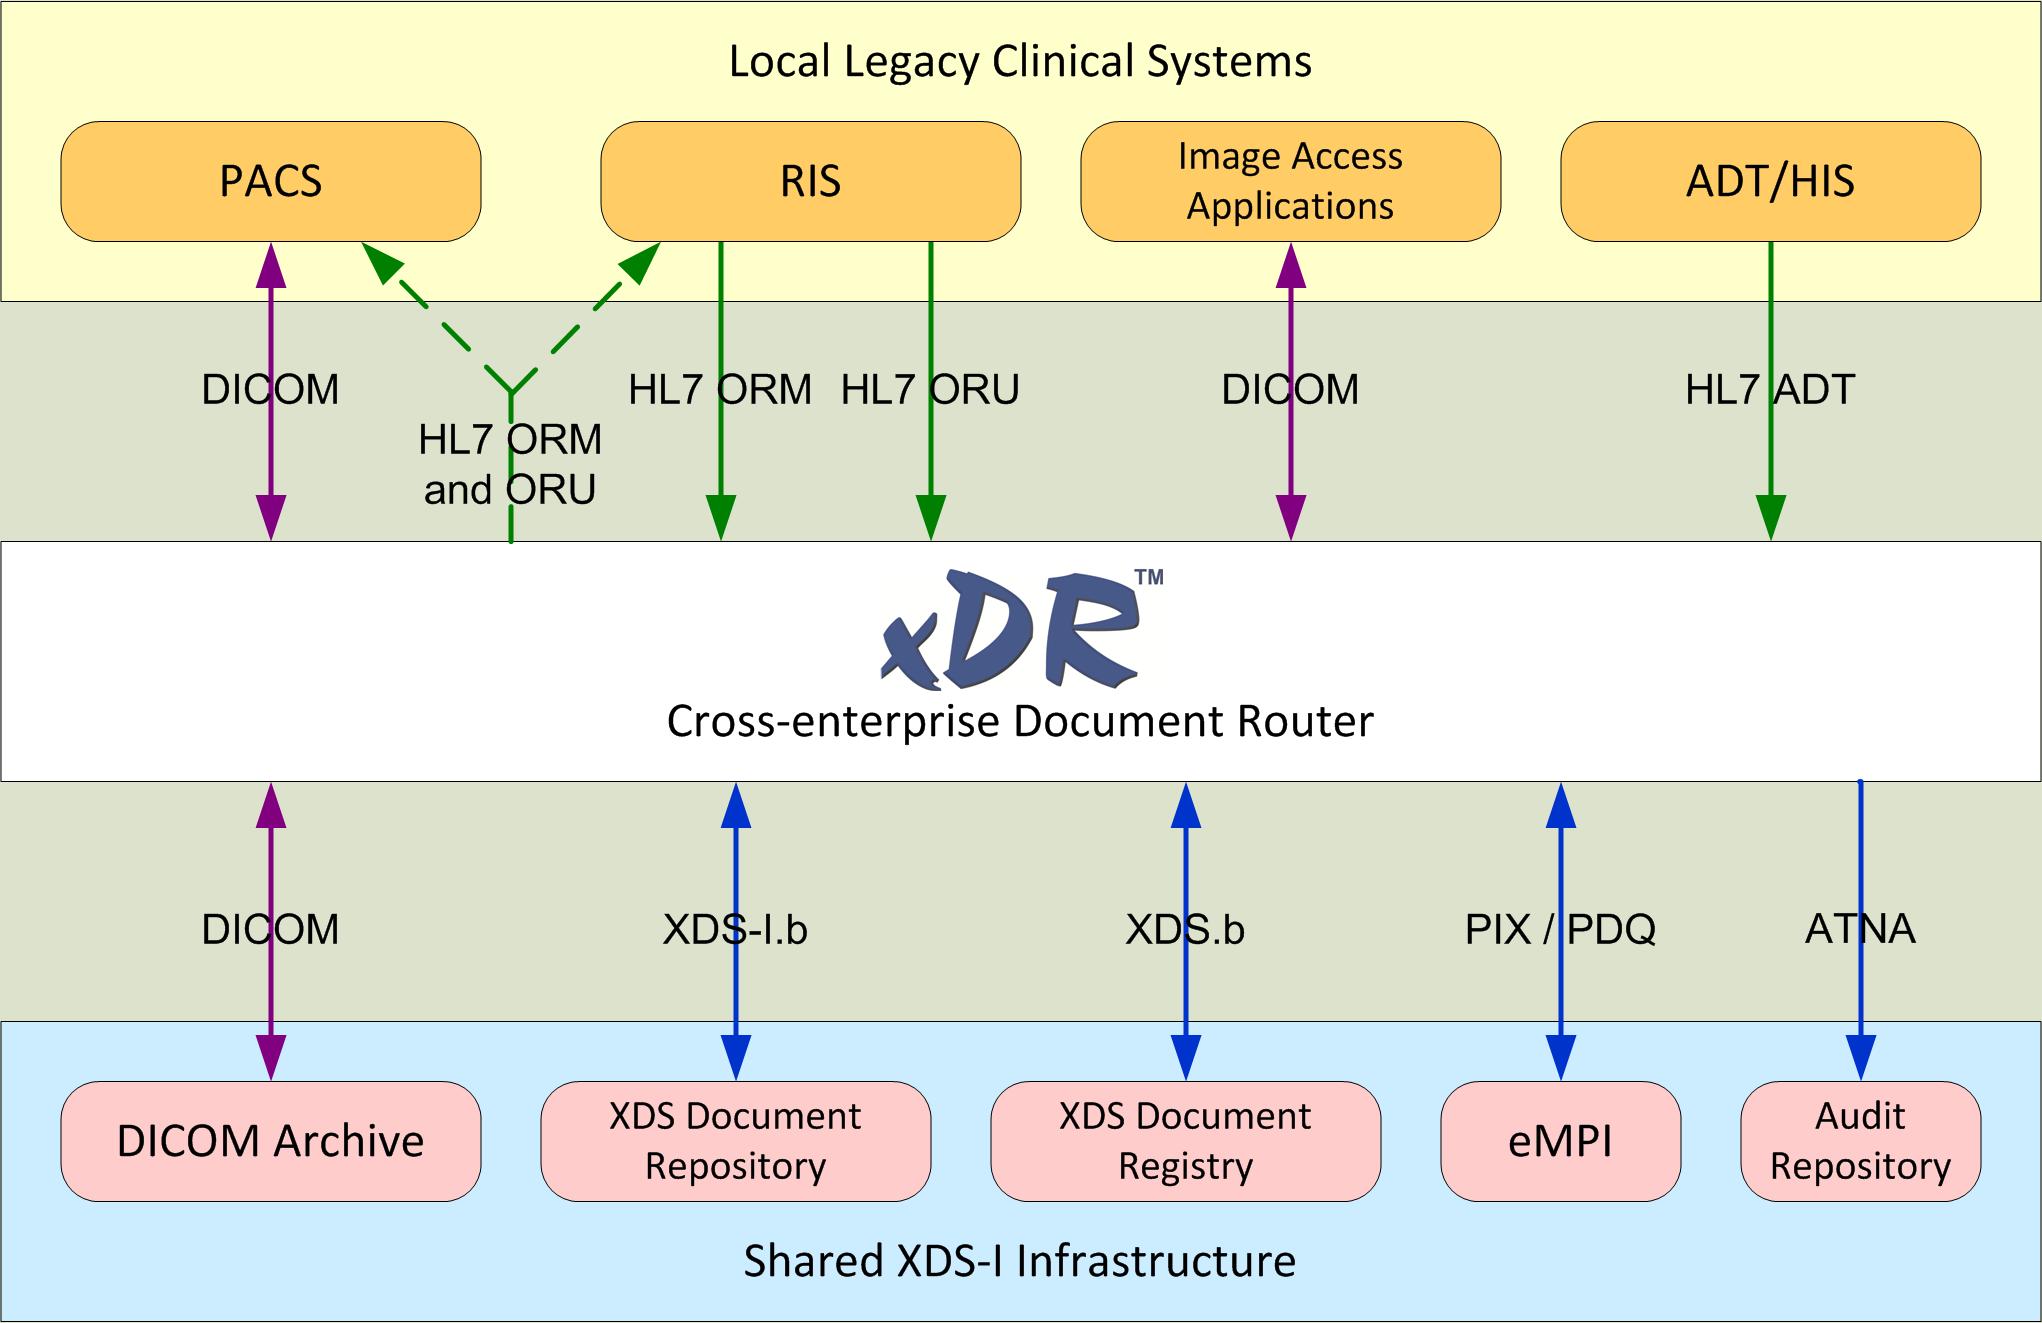 xDR | DeJarnette Research Systems, Inc